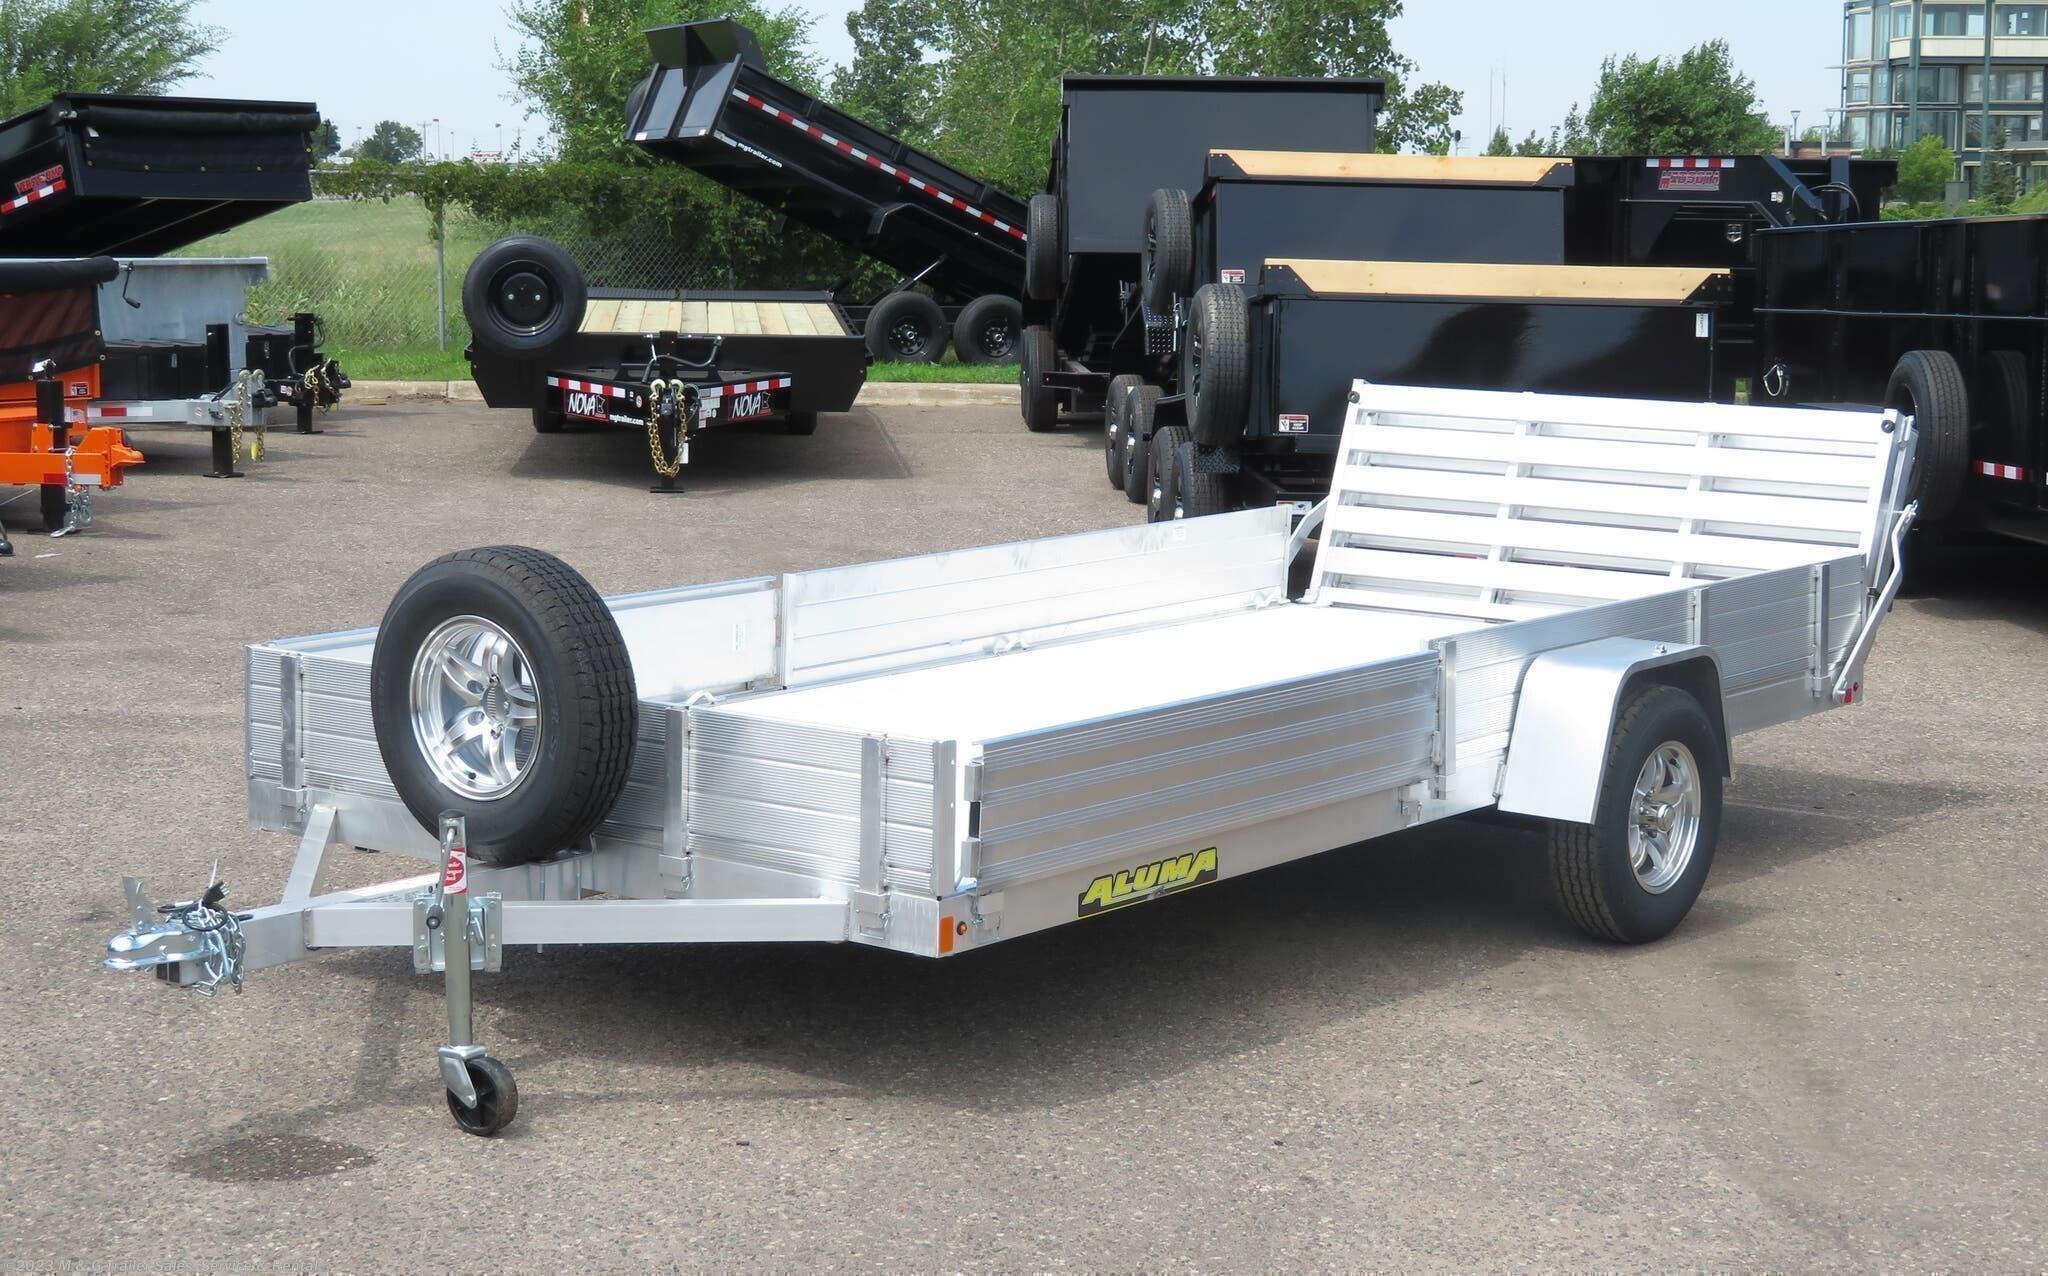 2022 Aluma 8114 SR Aluminum ATV/Utility Trailer - Stock #244061